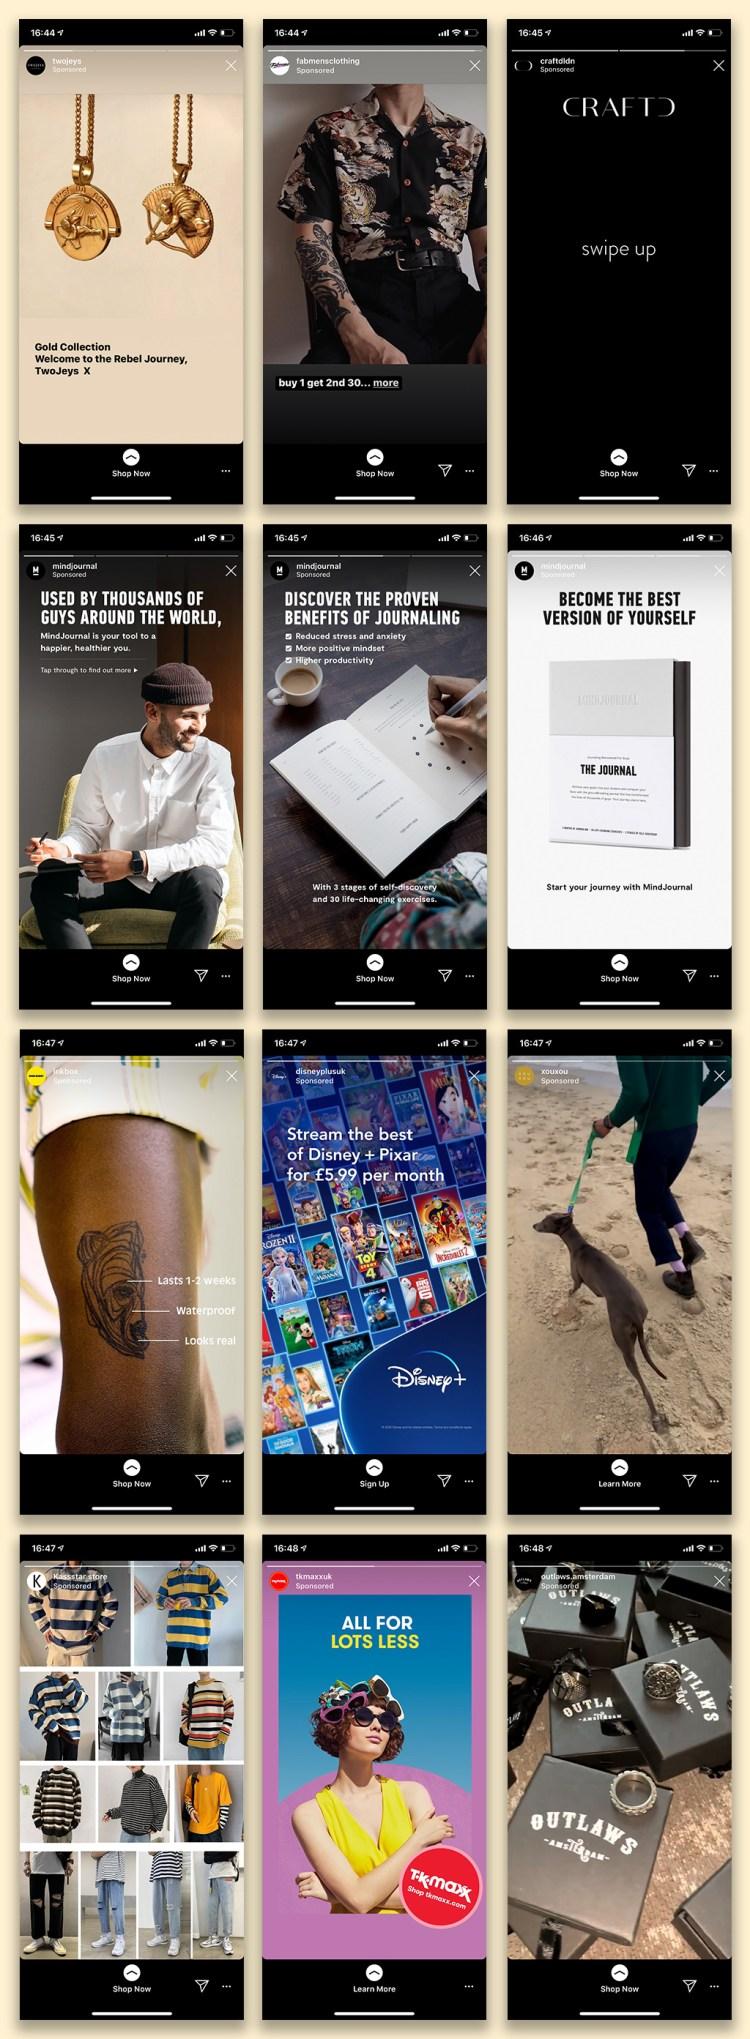 Examples of swipe-up Instagram stories